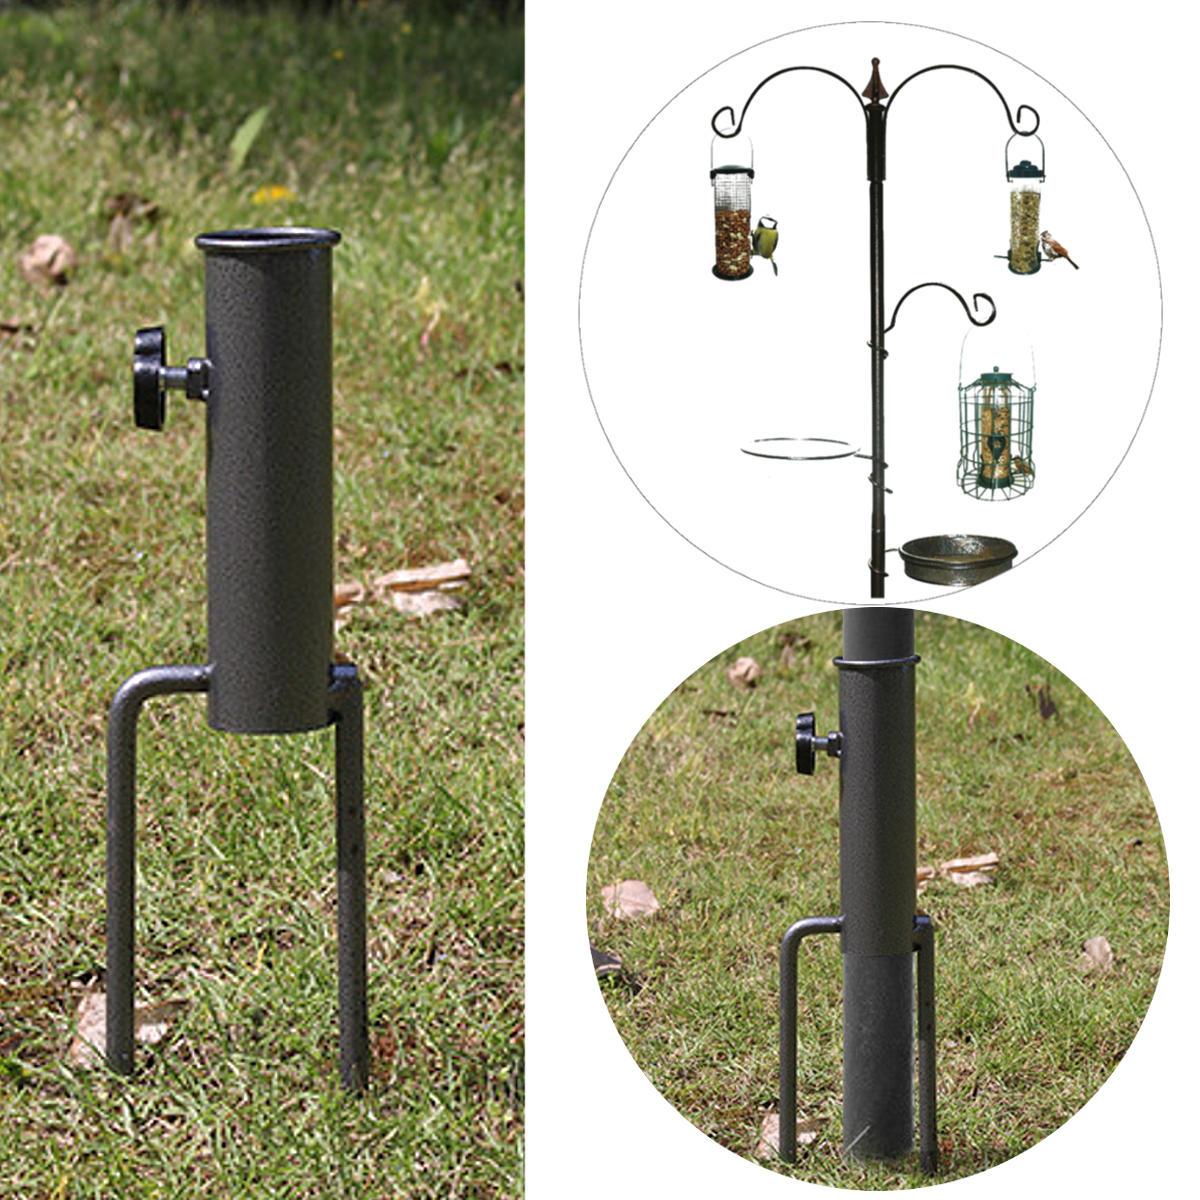 Bird Feeder Pole Hangers Feeding Station Stabilizer Feet SpikesStand Feed Tube Garden Lawn